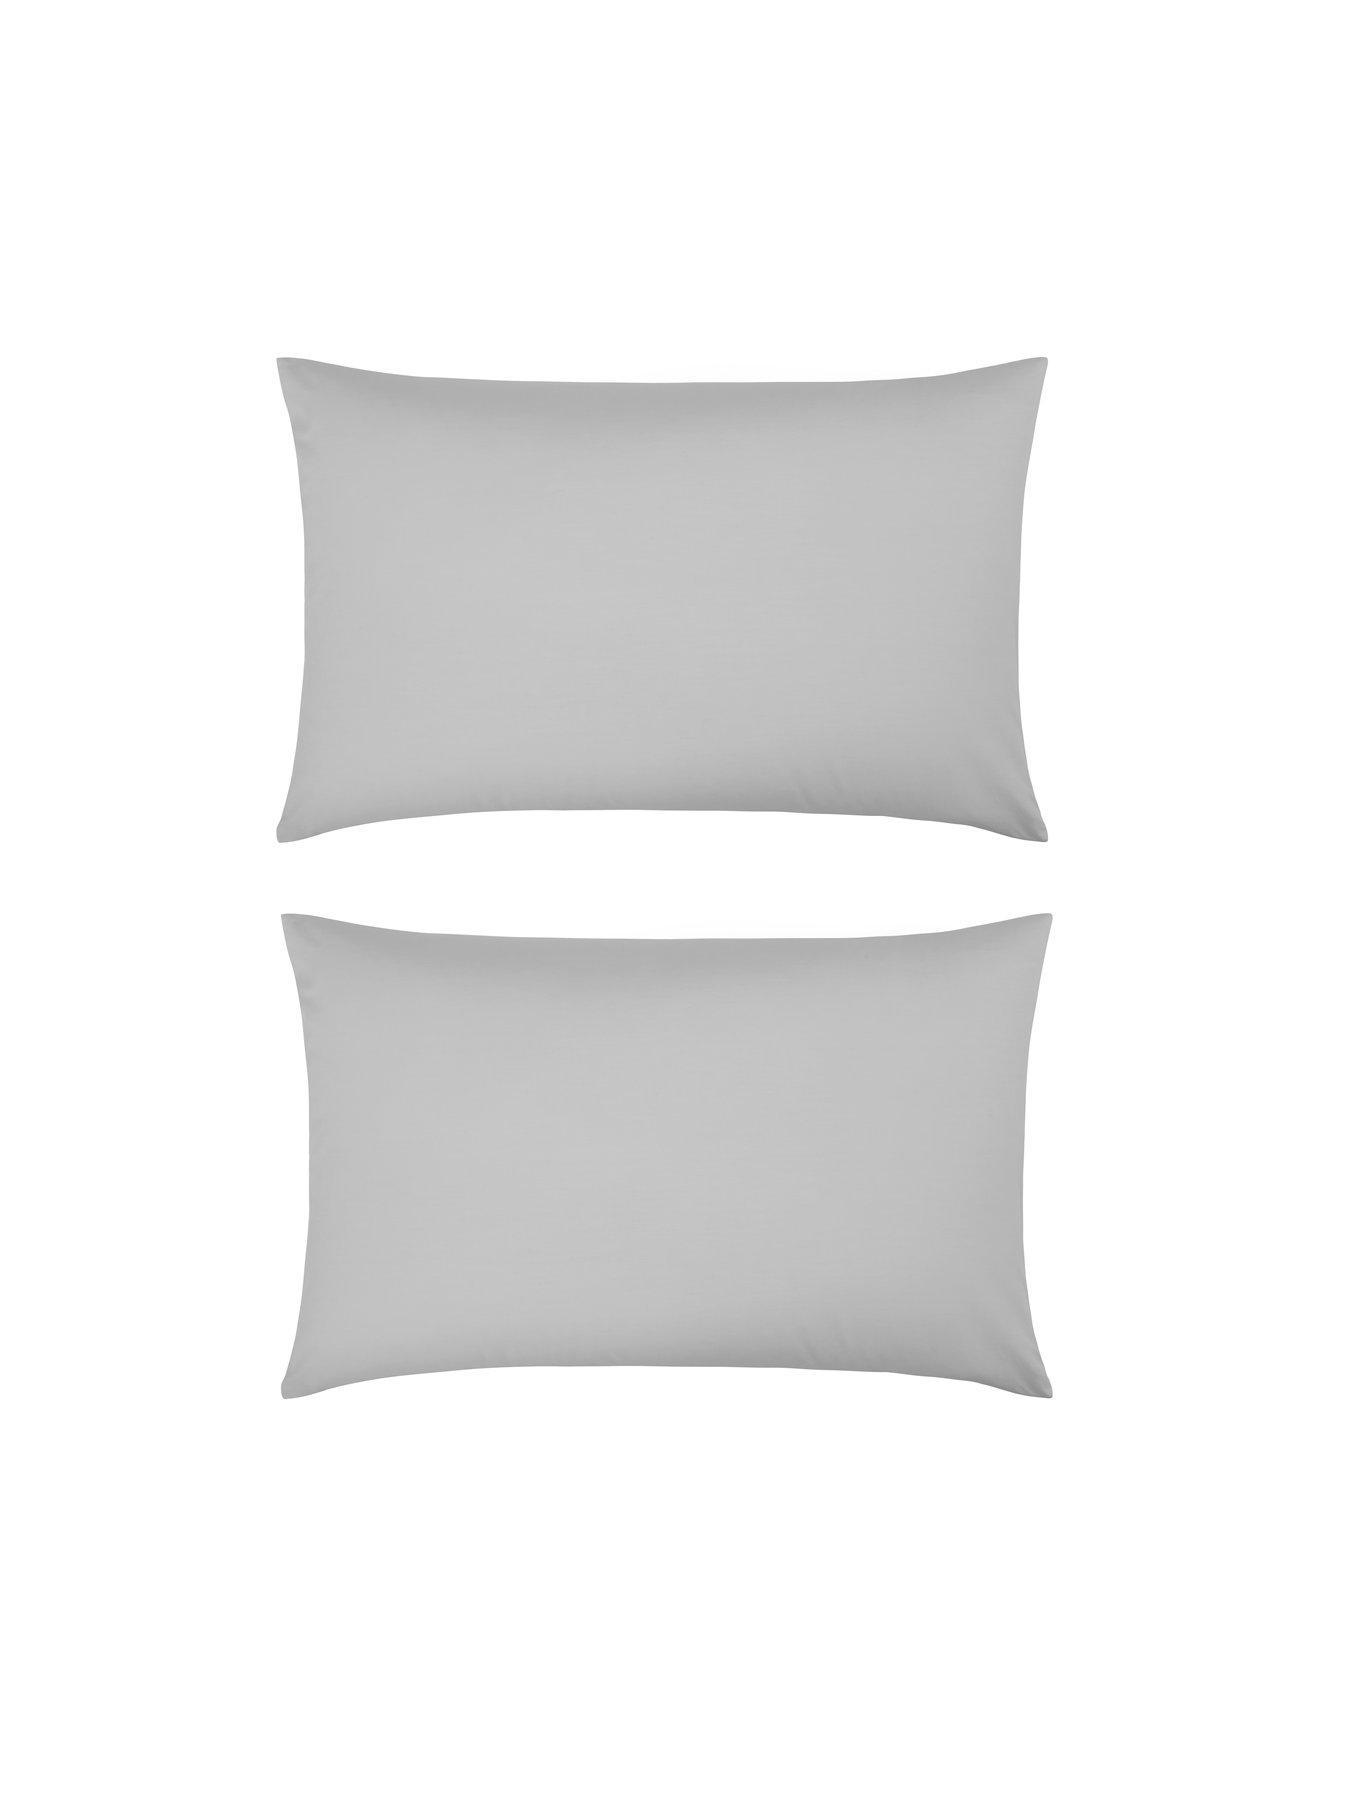 Plain One Colour Square Pillowcase 63 x